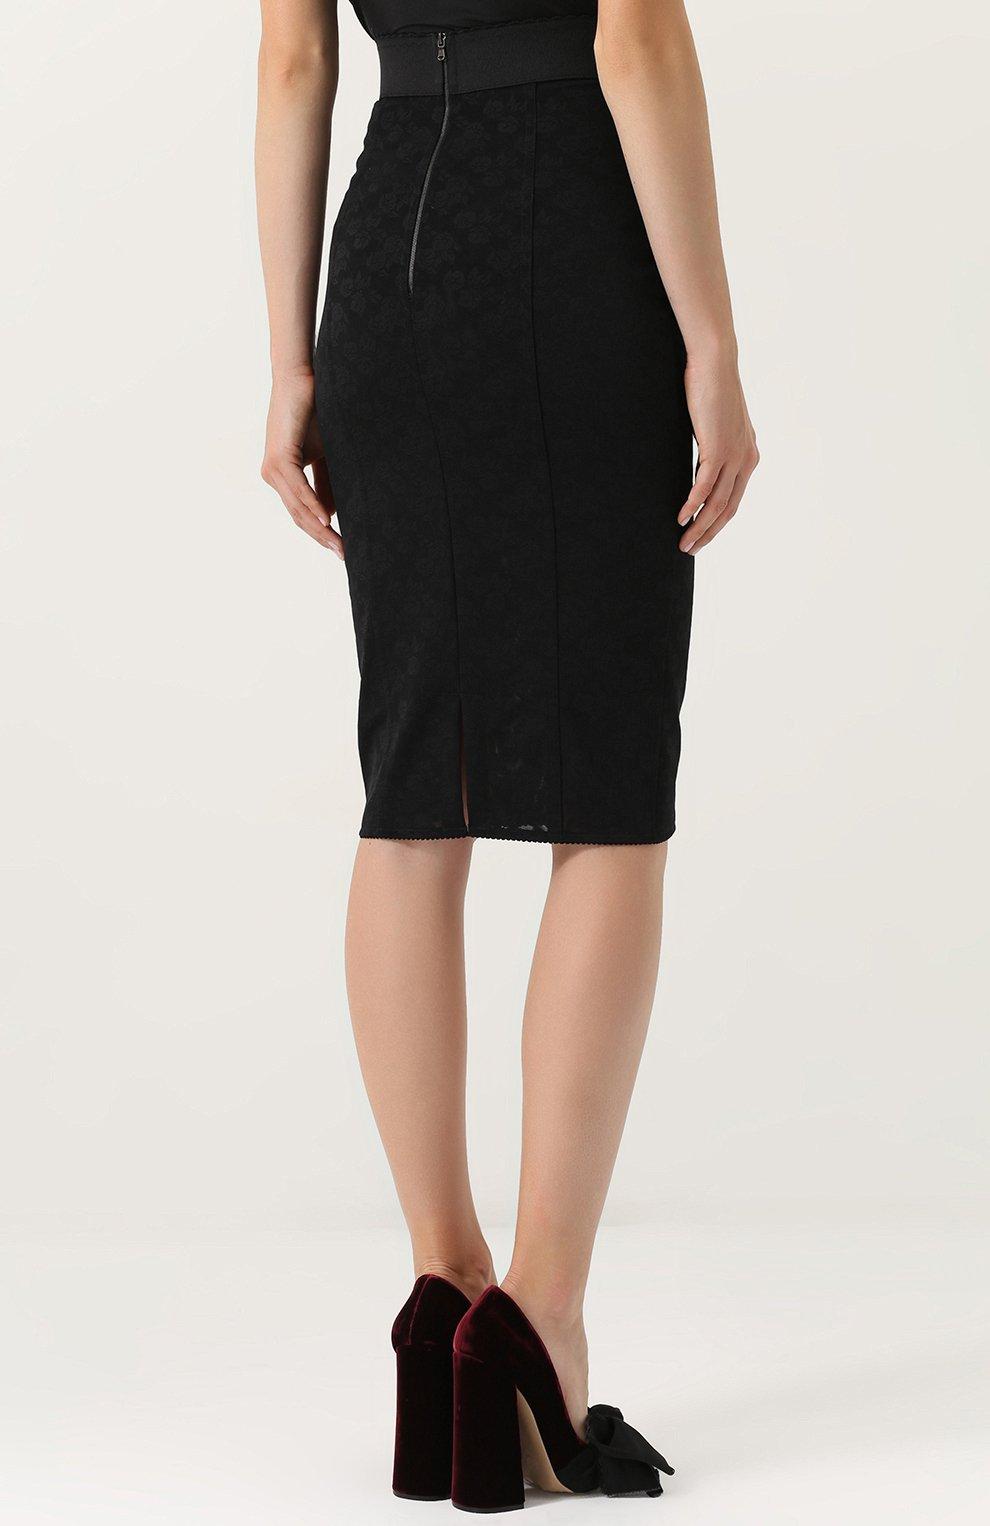 Кружевная юбка-карандаш со шнуровкой Dolce & Gabbana черная | Фото №4